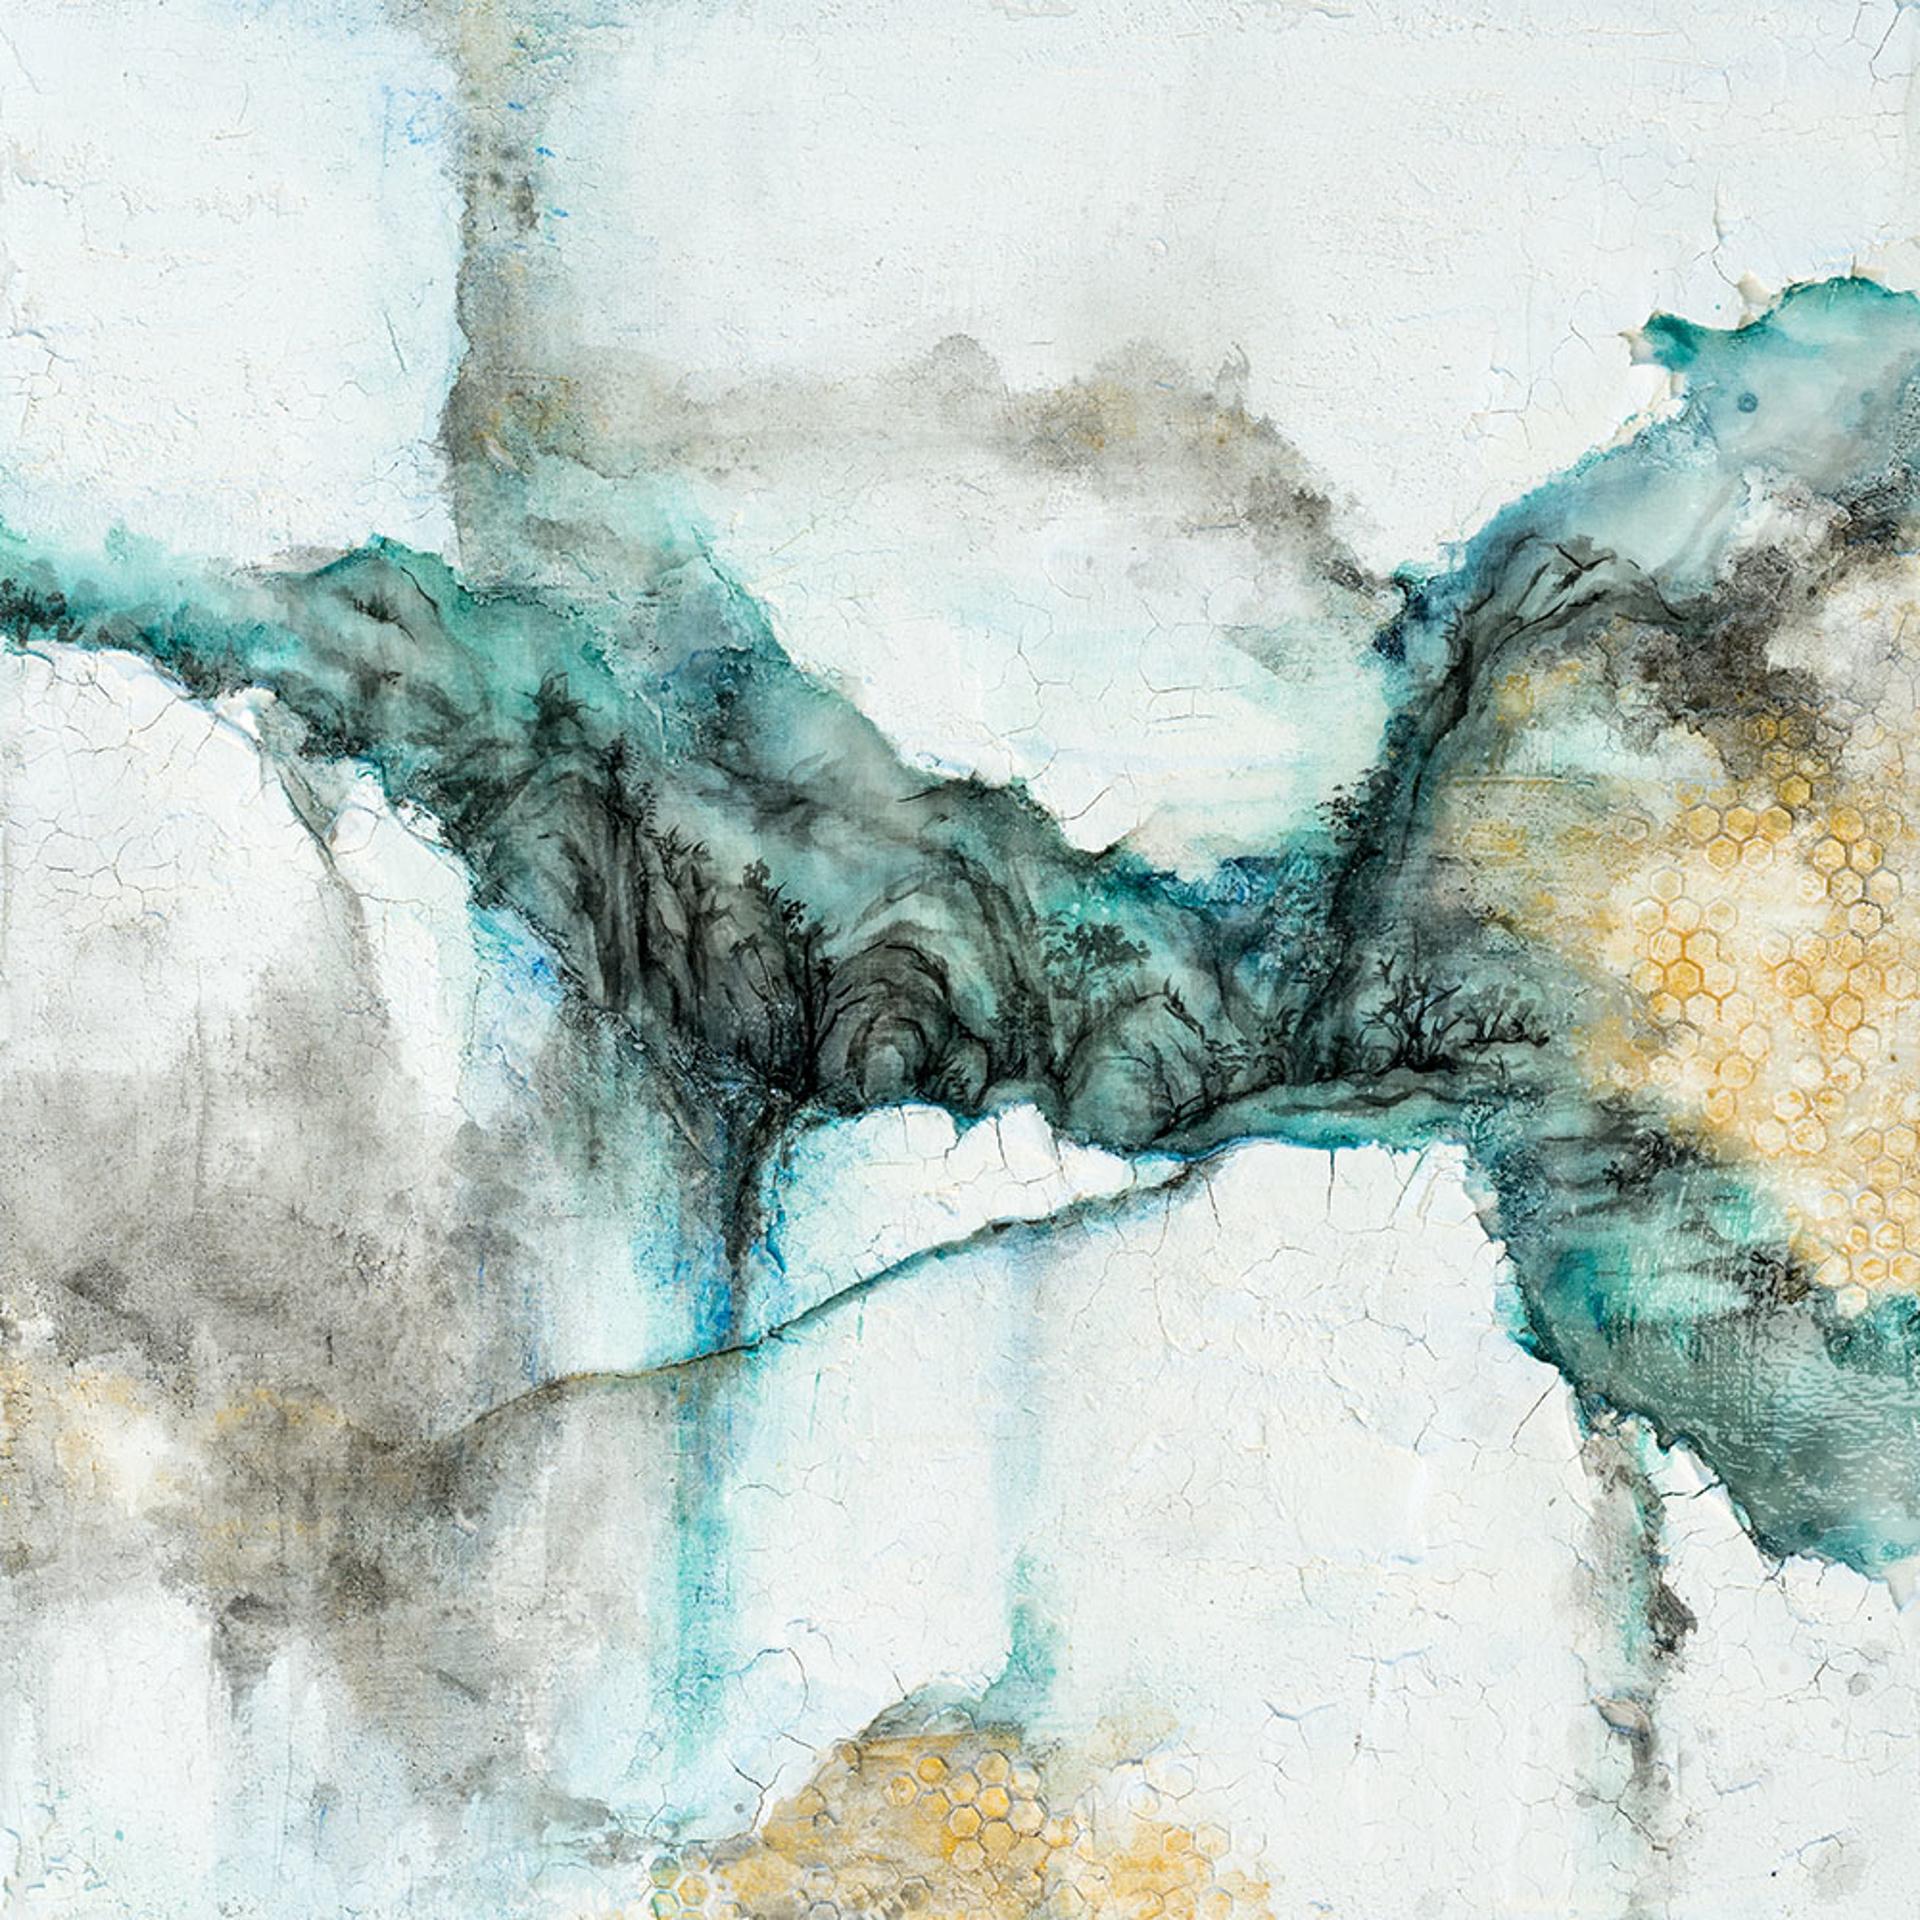 Chasm II by Cindy Shih